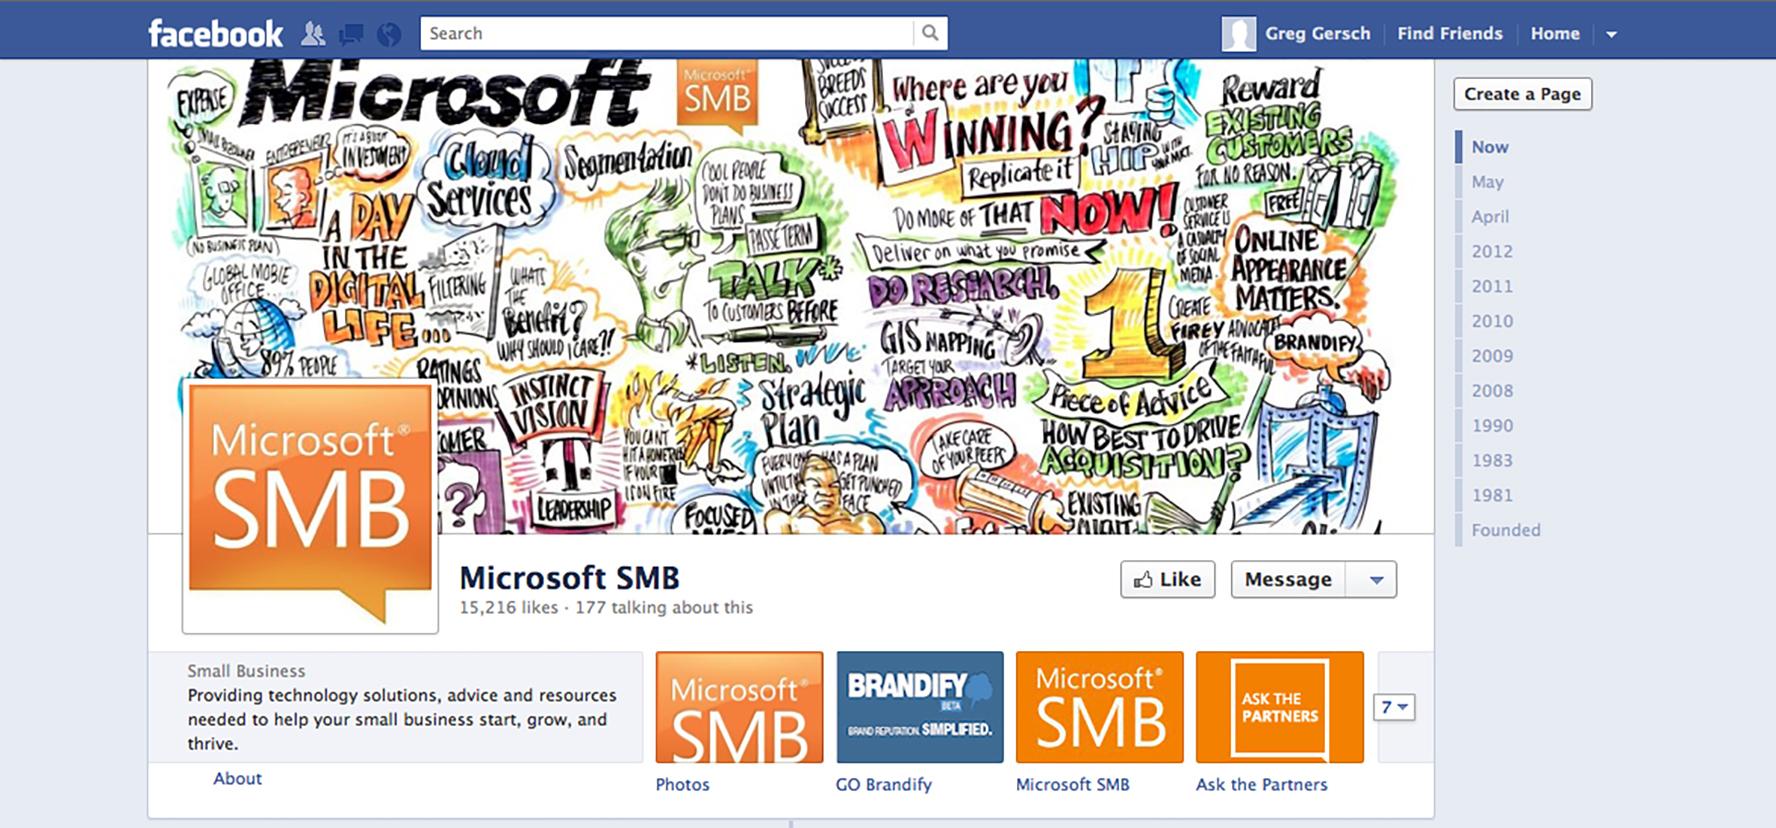 microsoft-fb-banner-2012.jpg